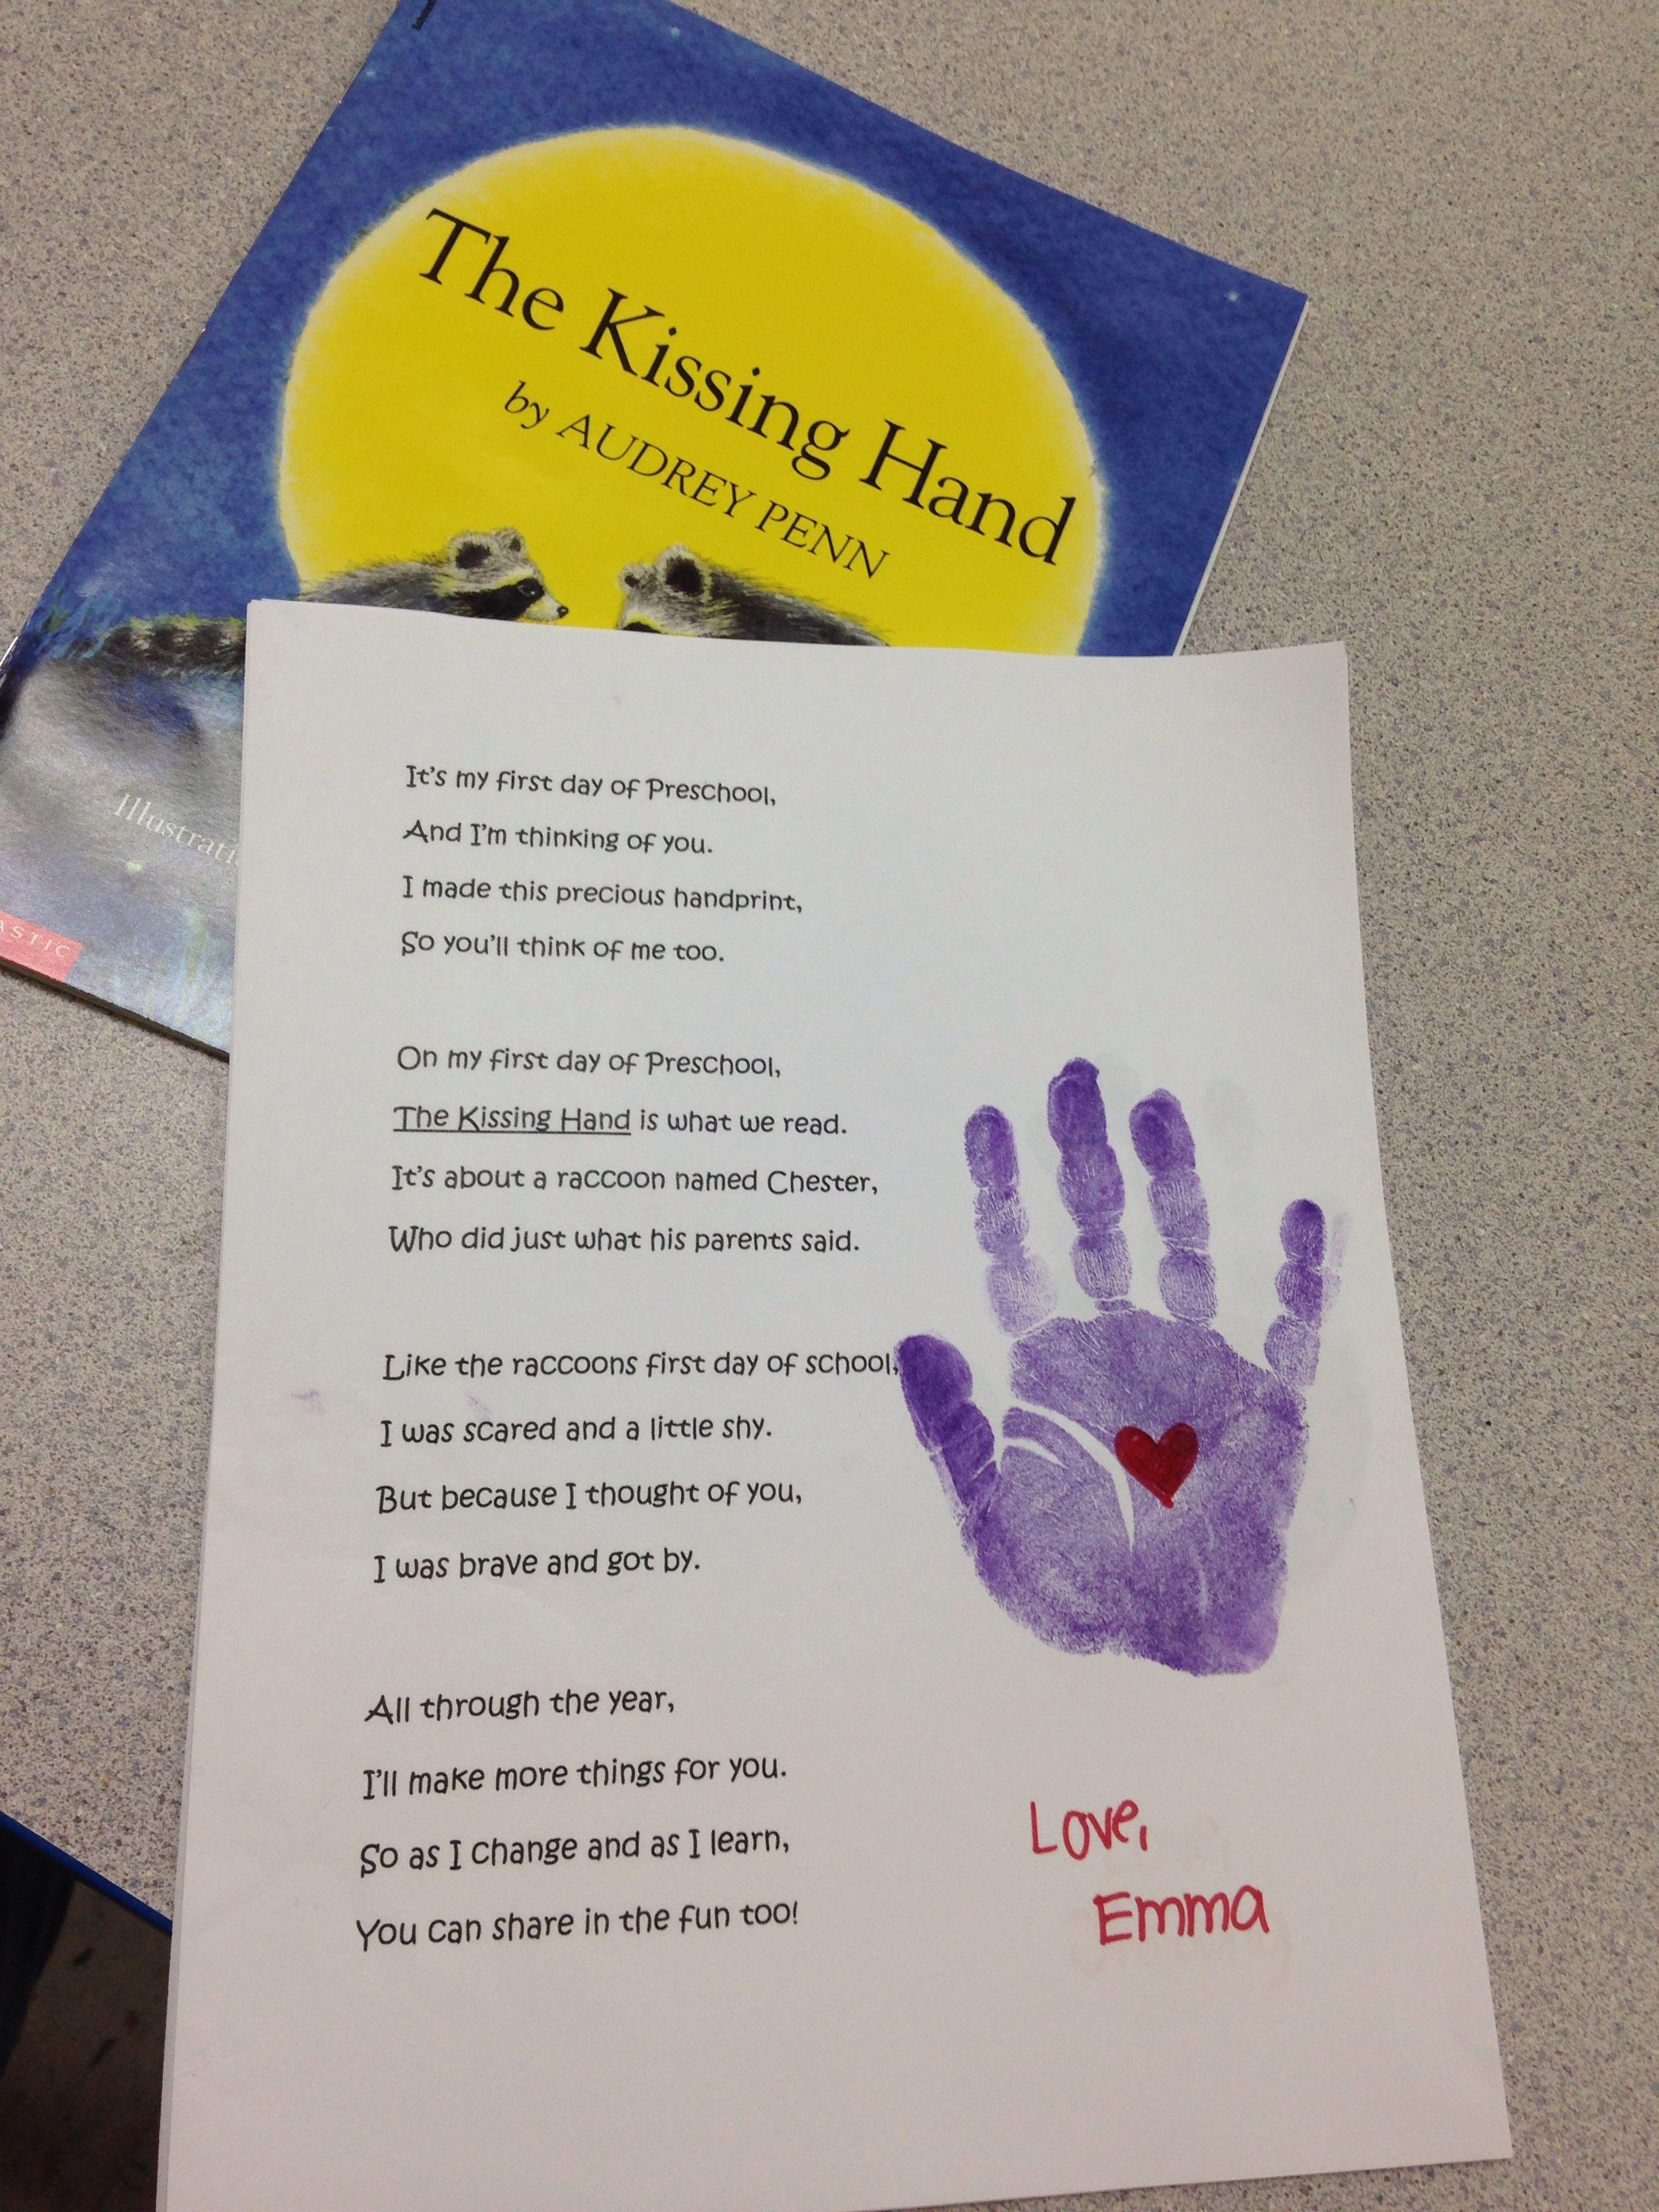 Preschool The Kissing Hand Poem And Handprint